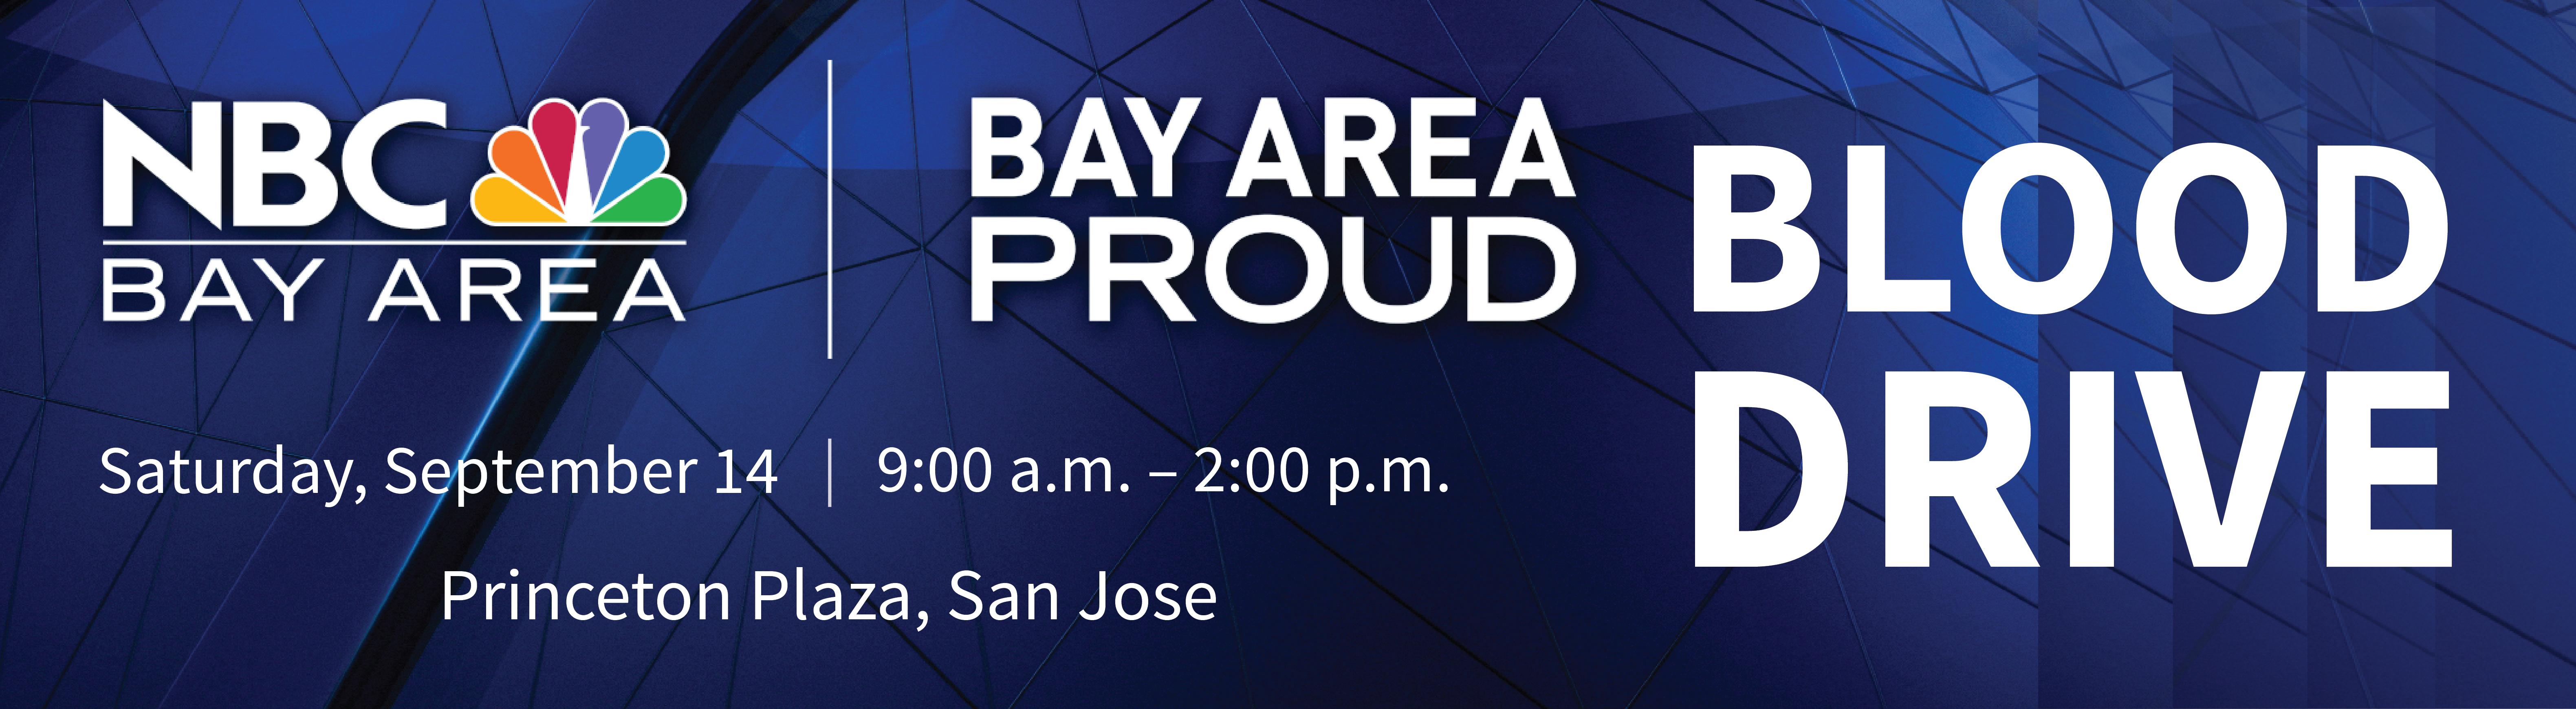 NBC Bay Area Proud Blood Drive